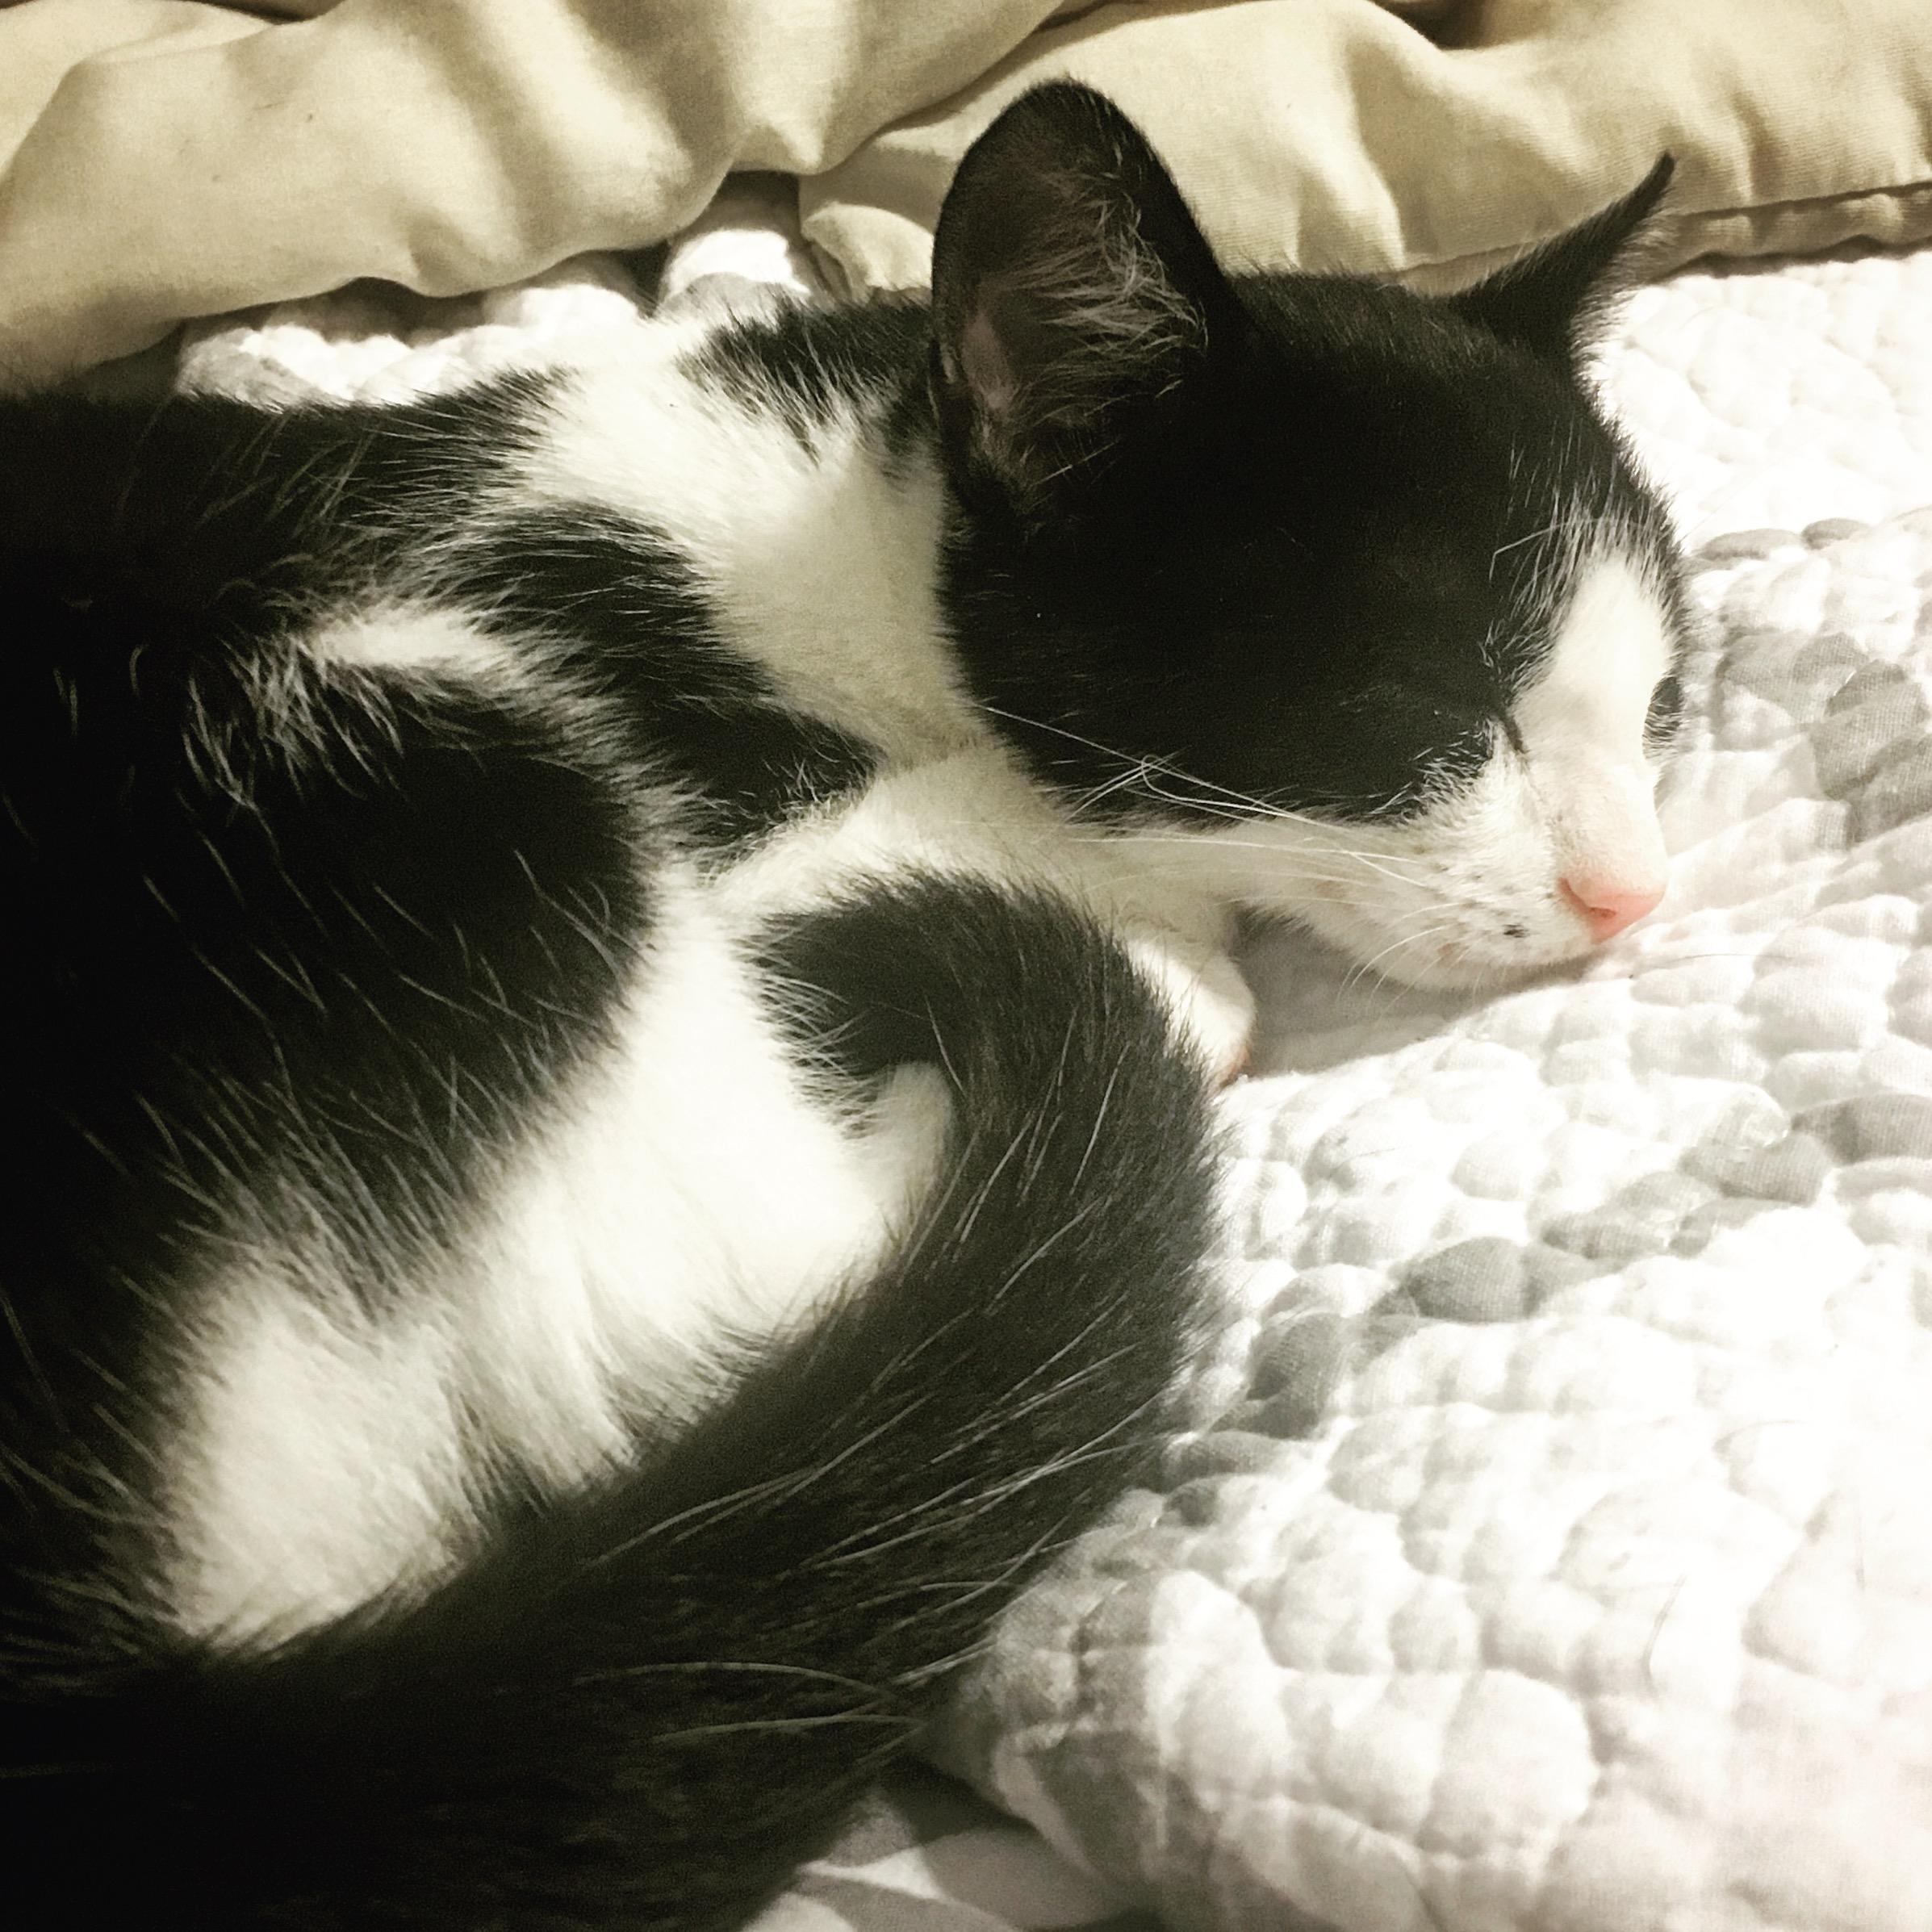 Soft kitty, warm kitty, little ball of fur......